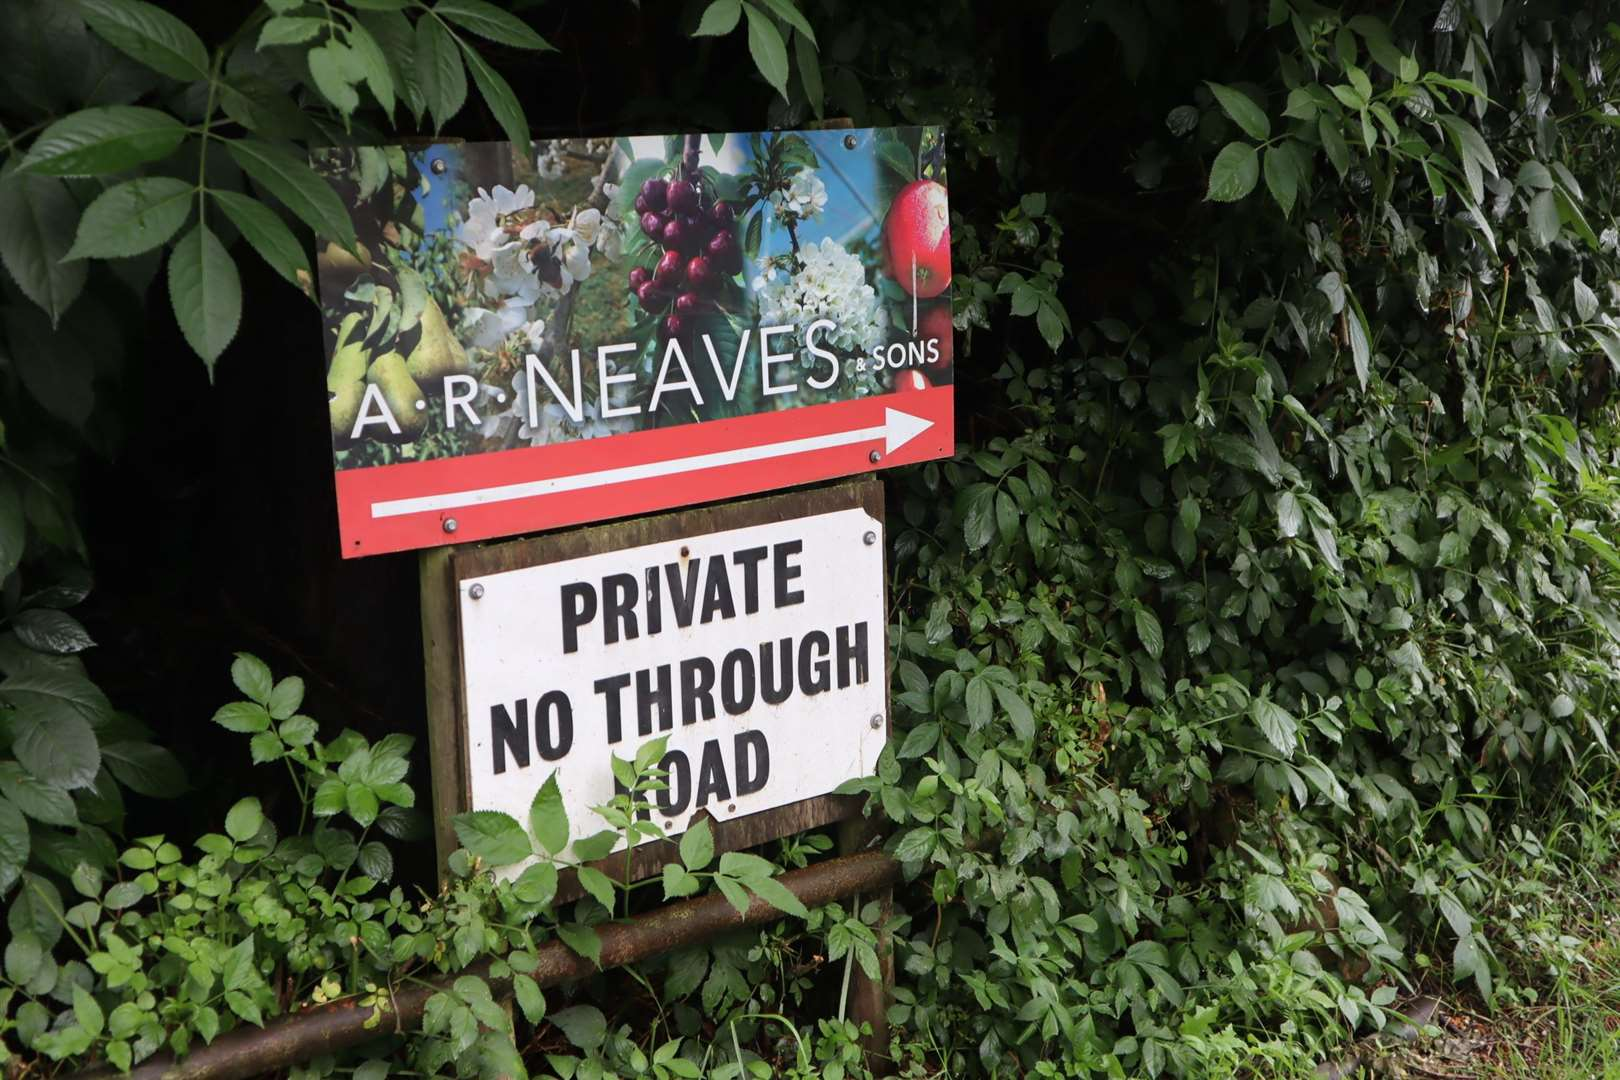 Sign at Little Sharsted Farm, Doddington, Sittingbourne